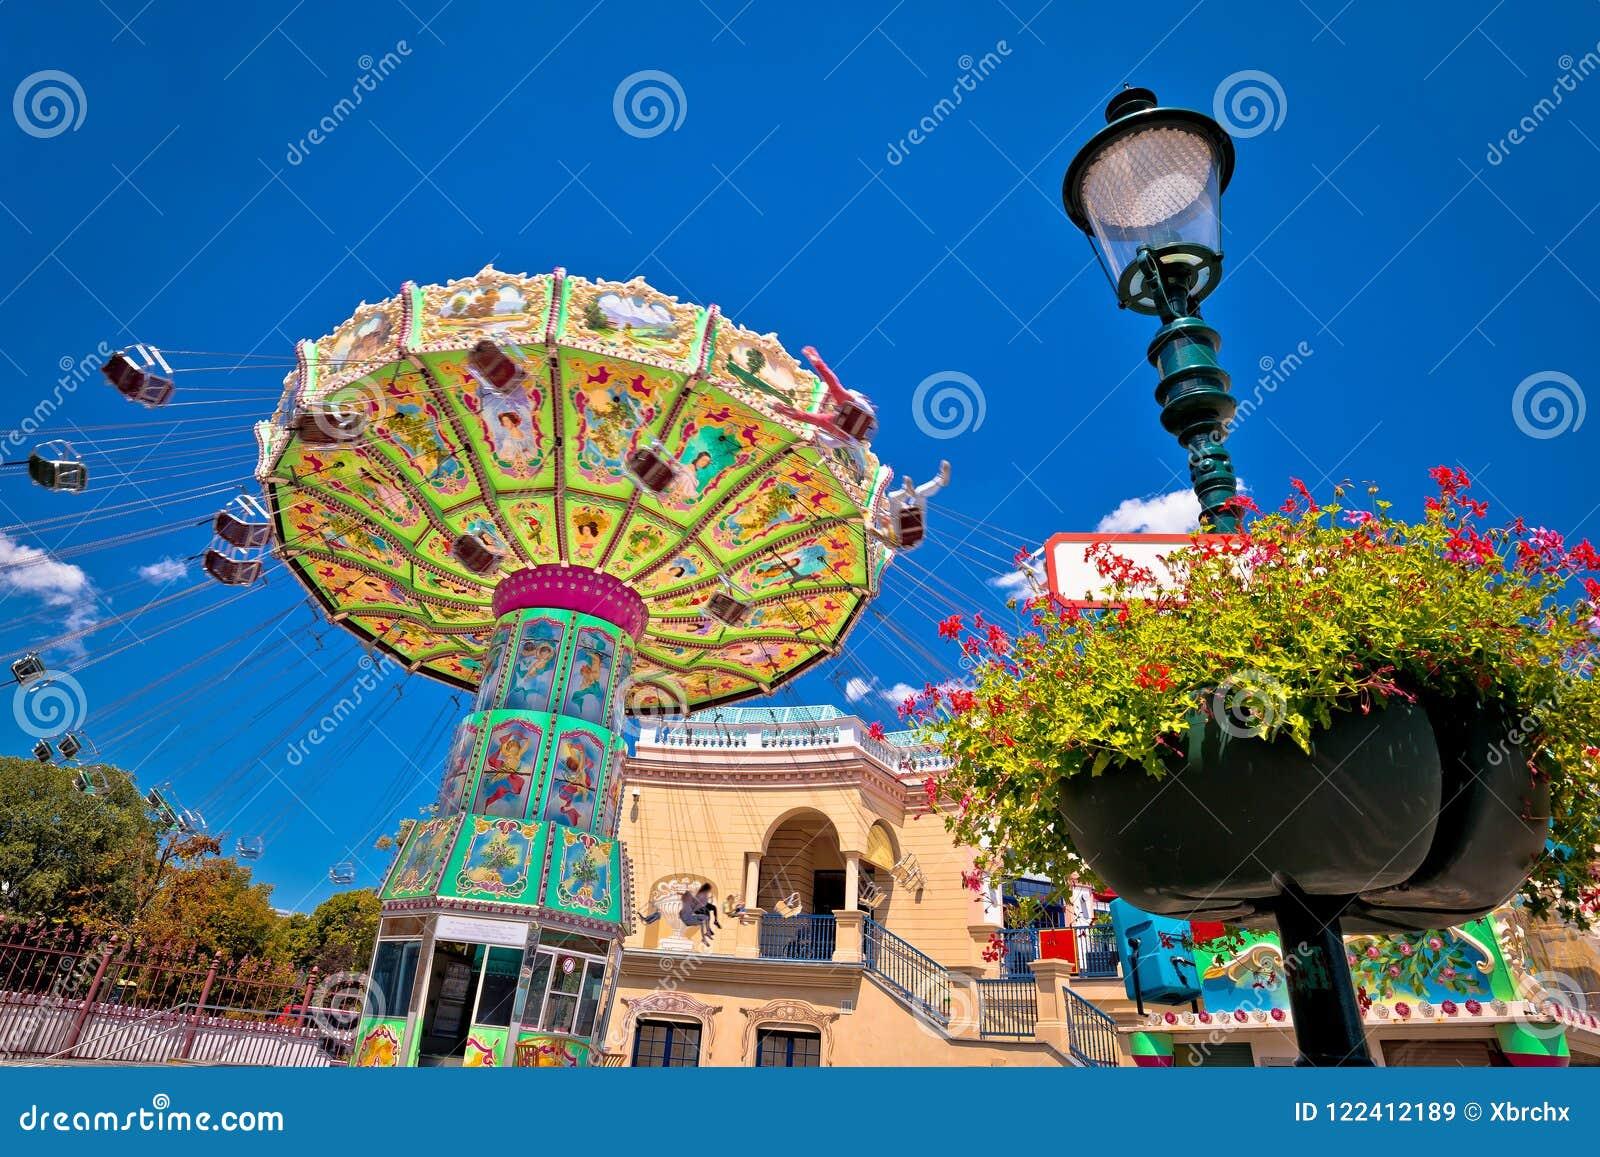 Carousel парка потехи Prater в взгляде вены